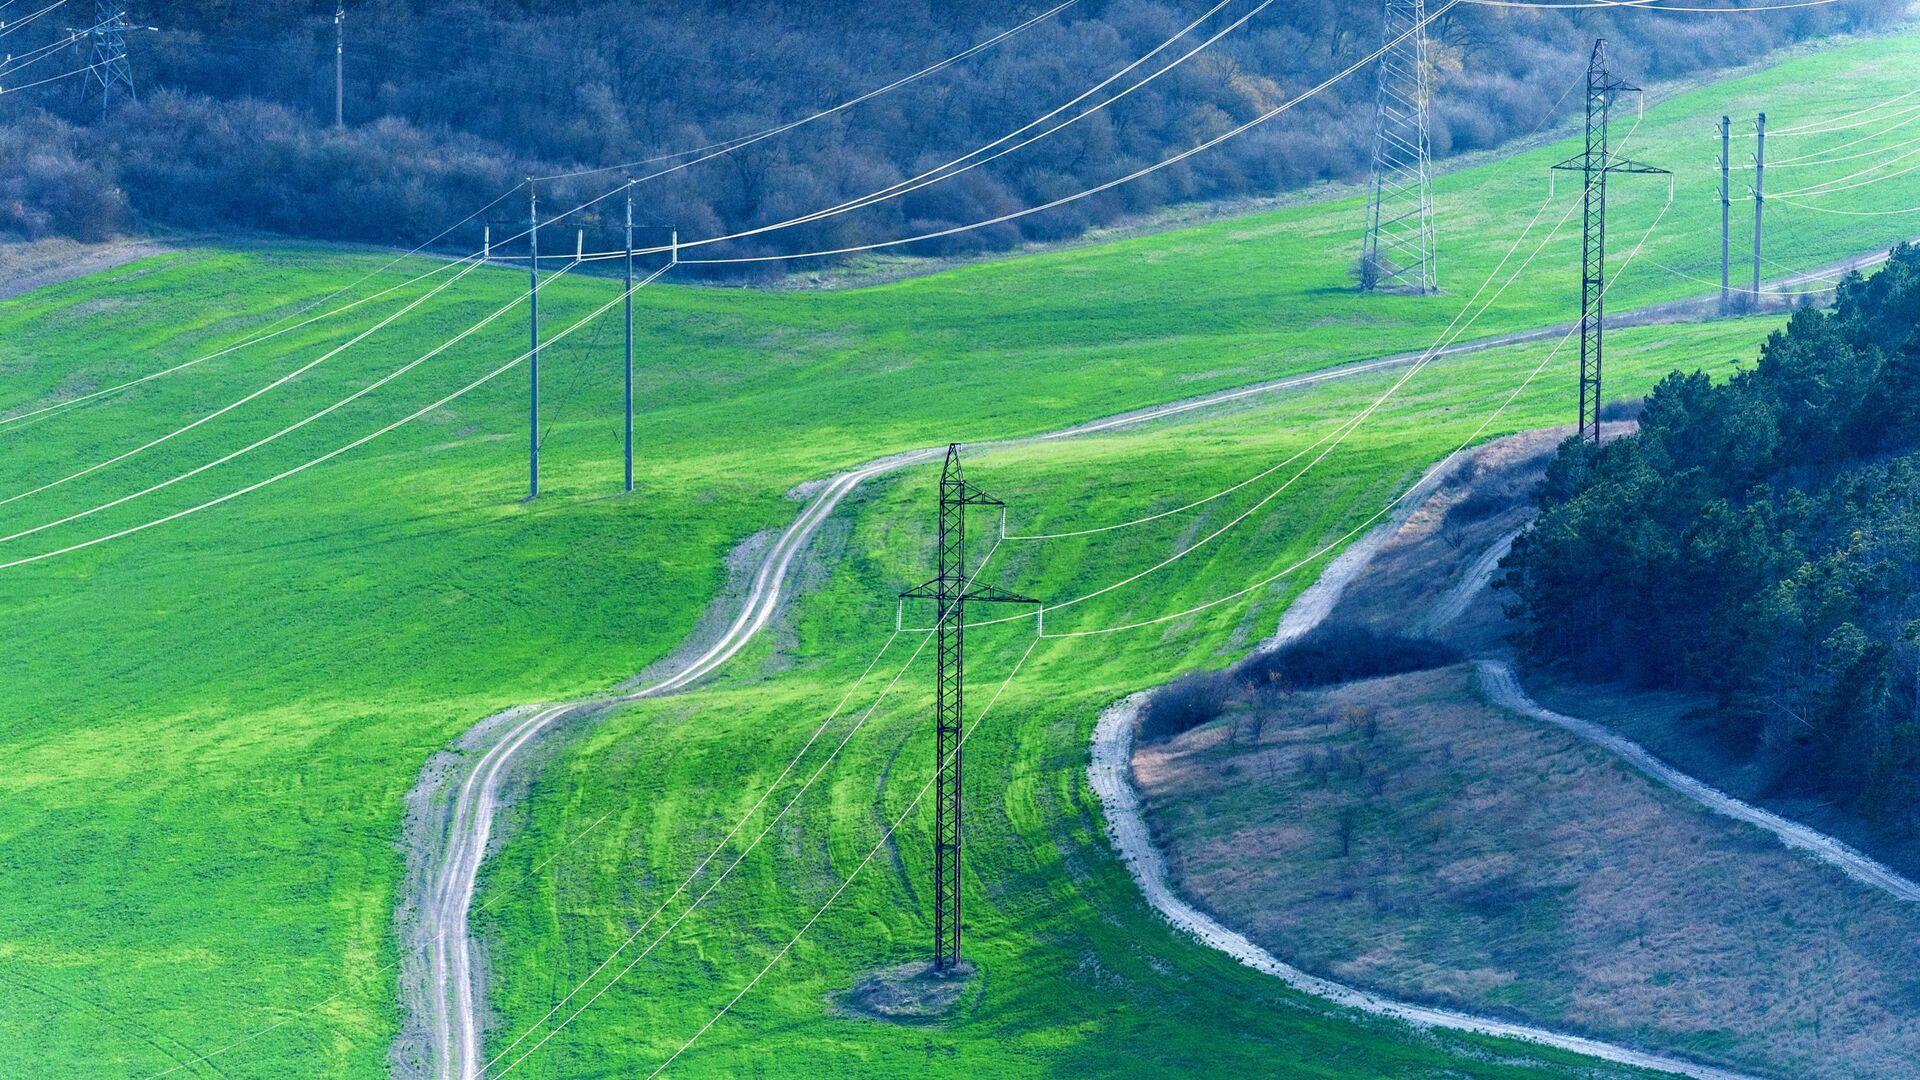 Линии электропередачи в деревне Клиновка, Крым - Sputnik Latvija, 1920, 07.06.2021